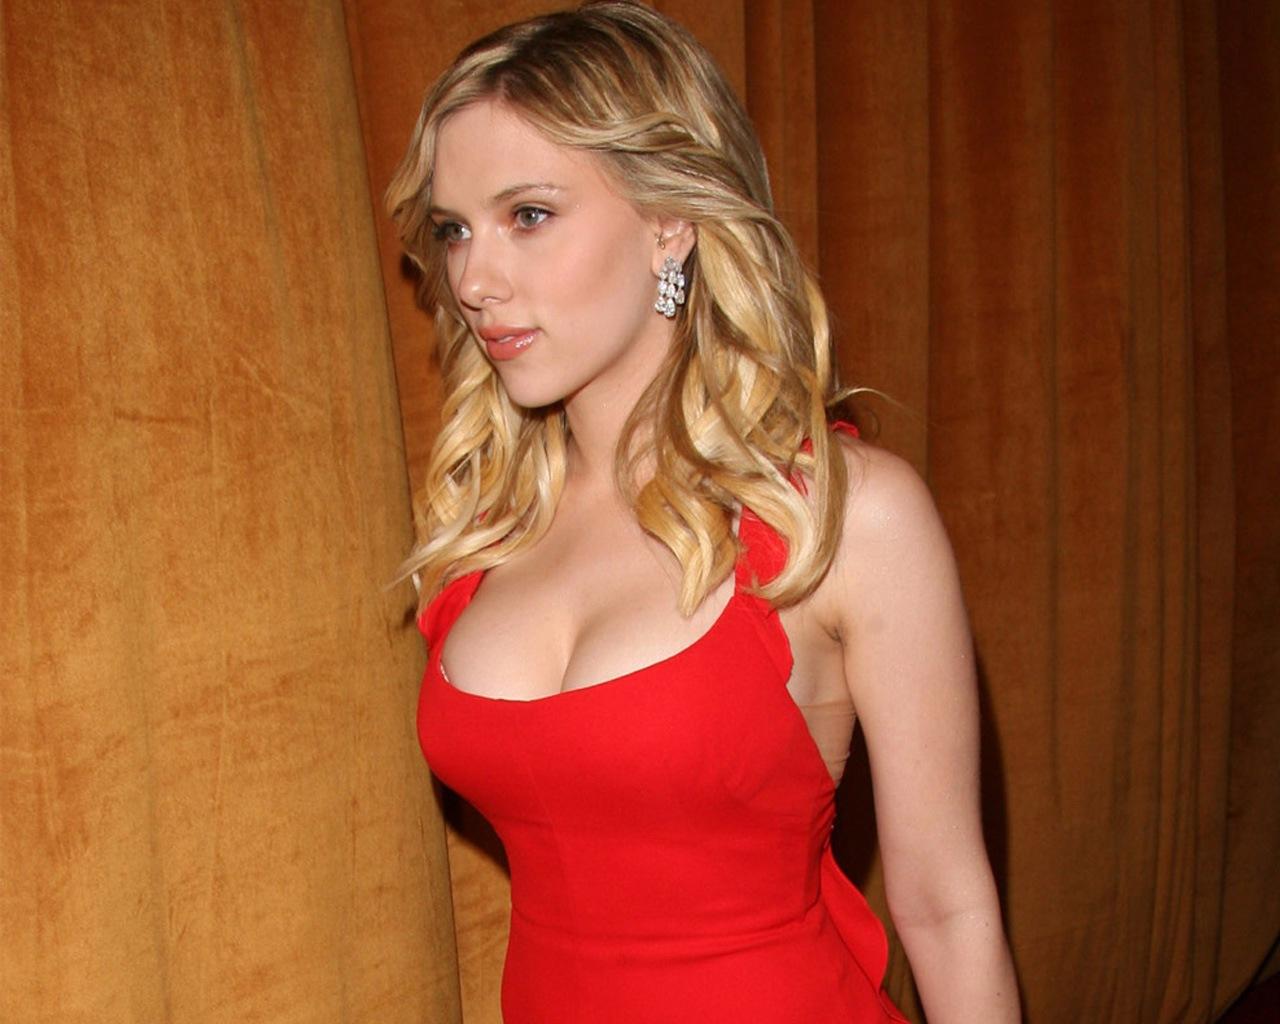 http://4.bp.blogspot.com/-0gy3_GhOwFw/T8-XP65yH3I/AAAAAAAAGS8/pt7HMPXaQws/s1600/Scarlett+Johansson13.jpg